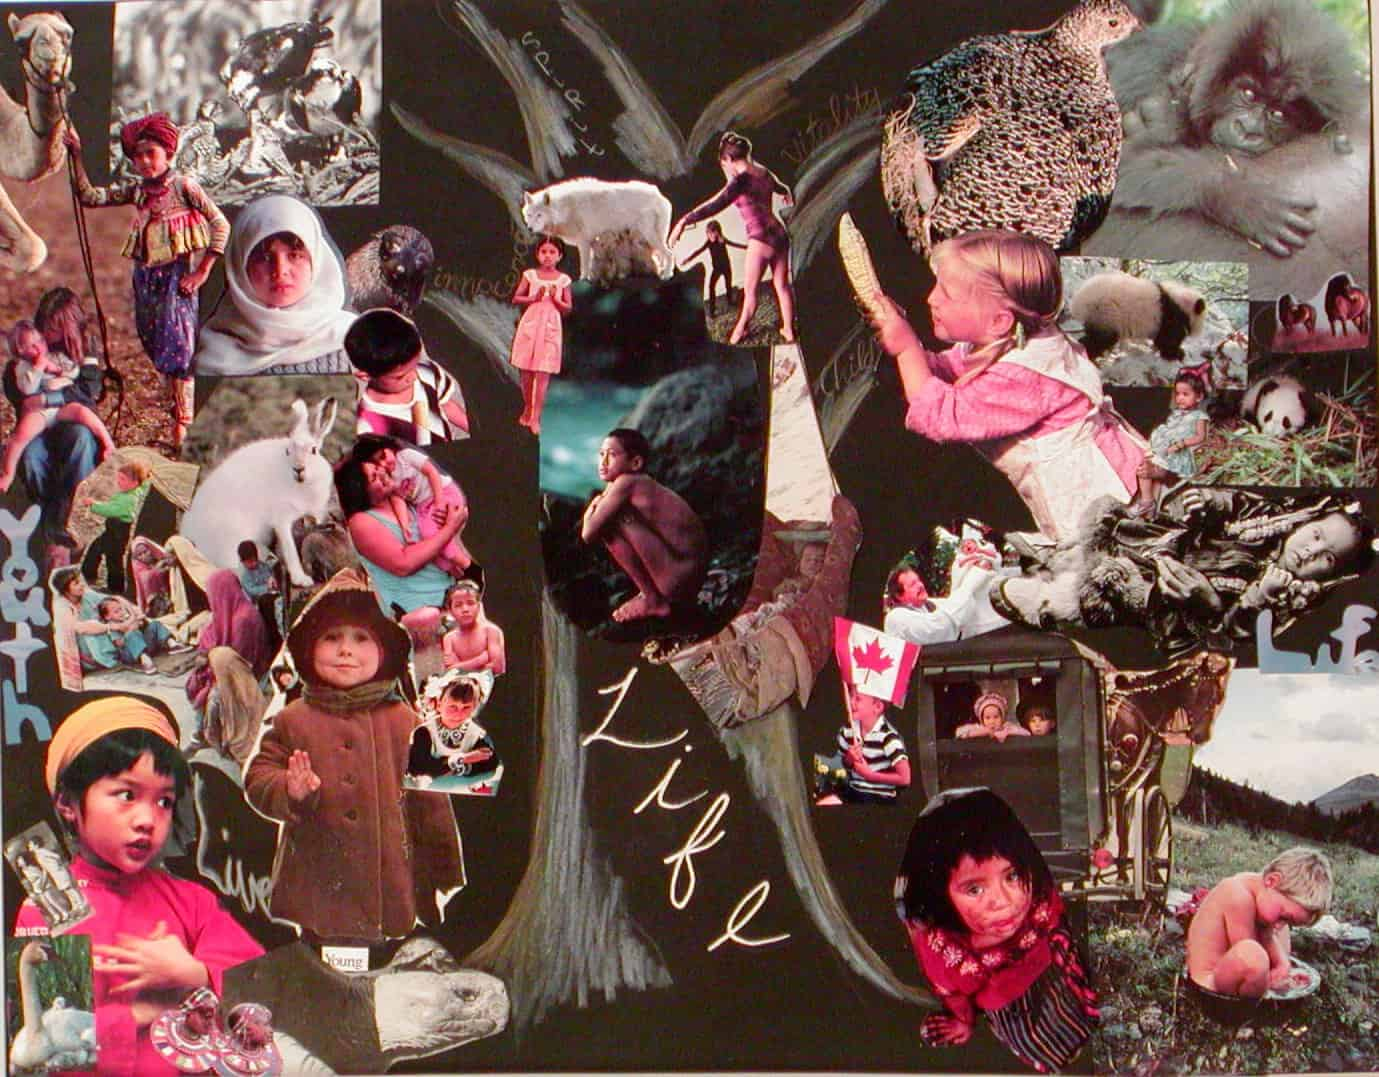 """LIFE""  by Natasha Compton & Maddy Stokes"